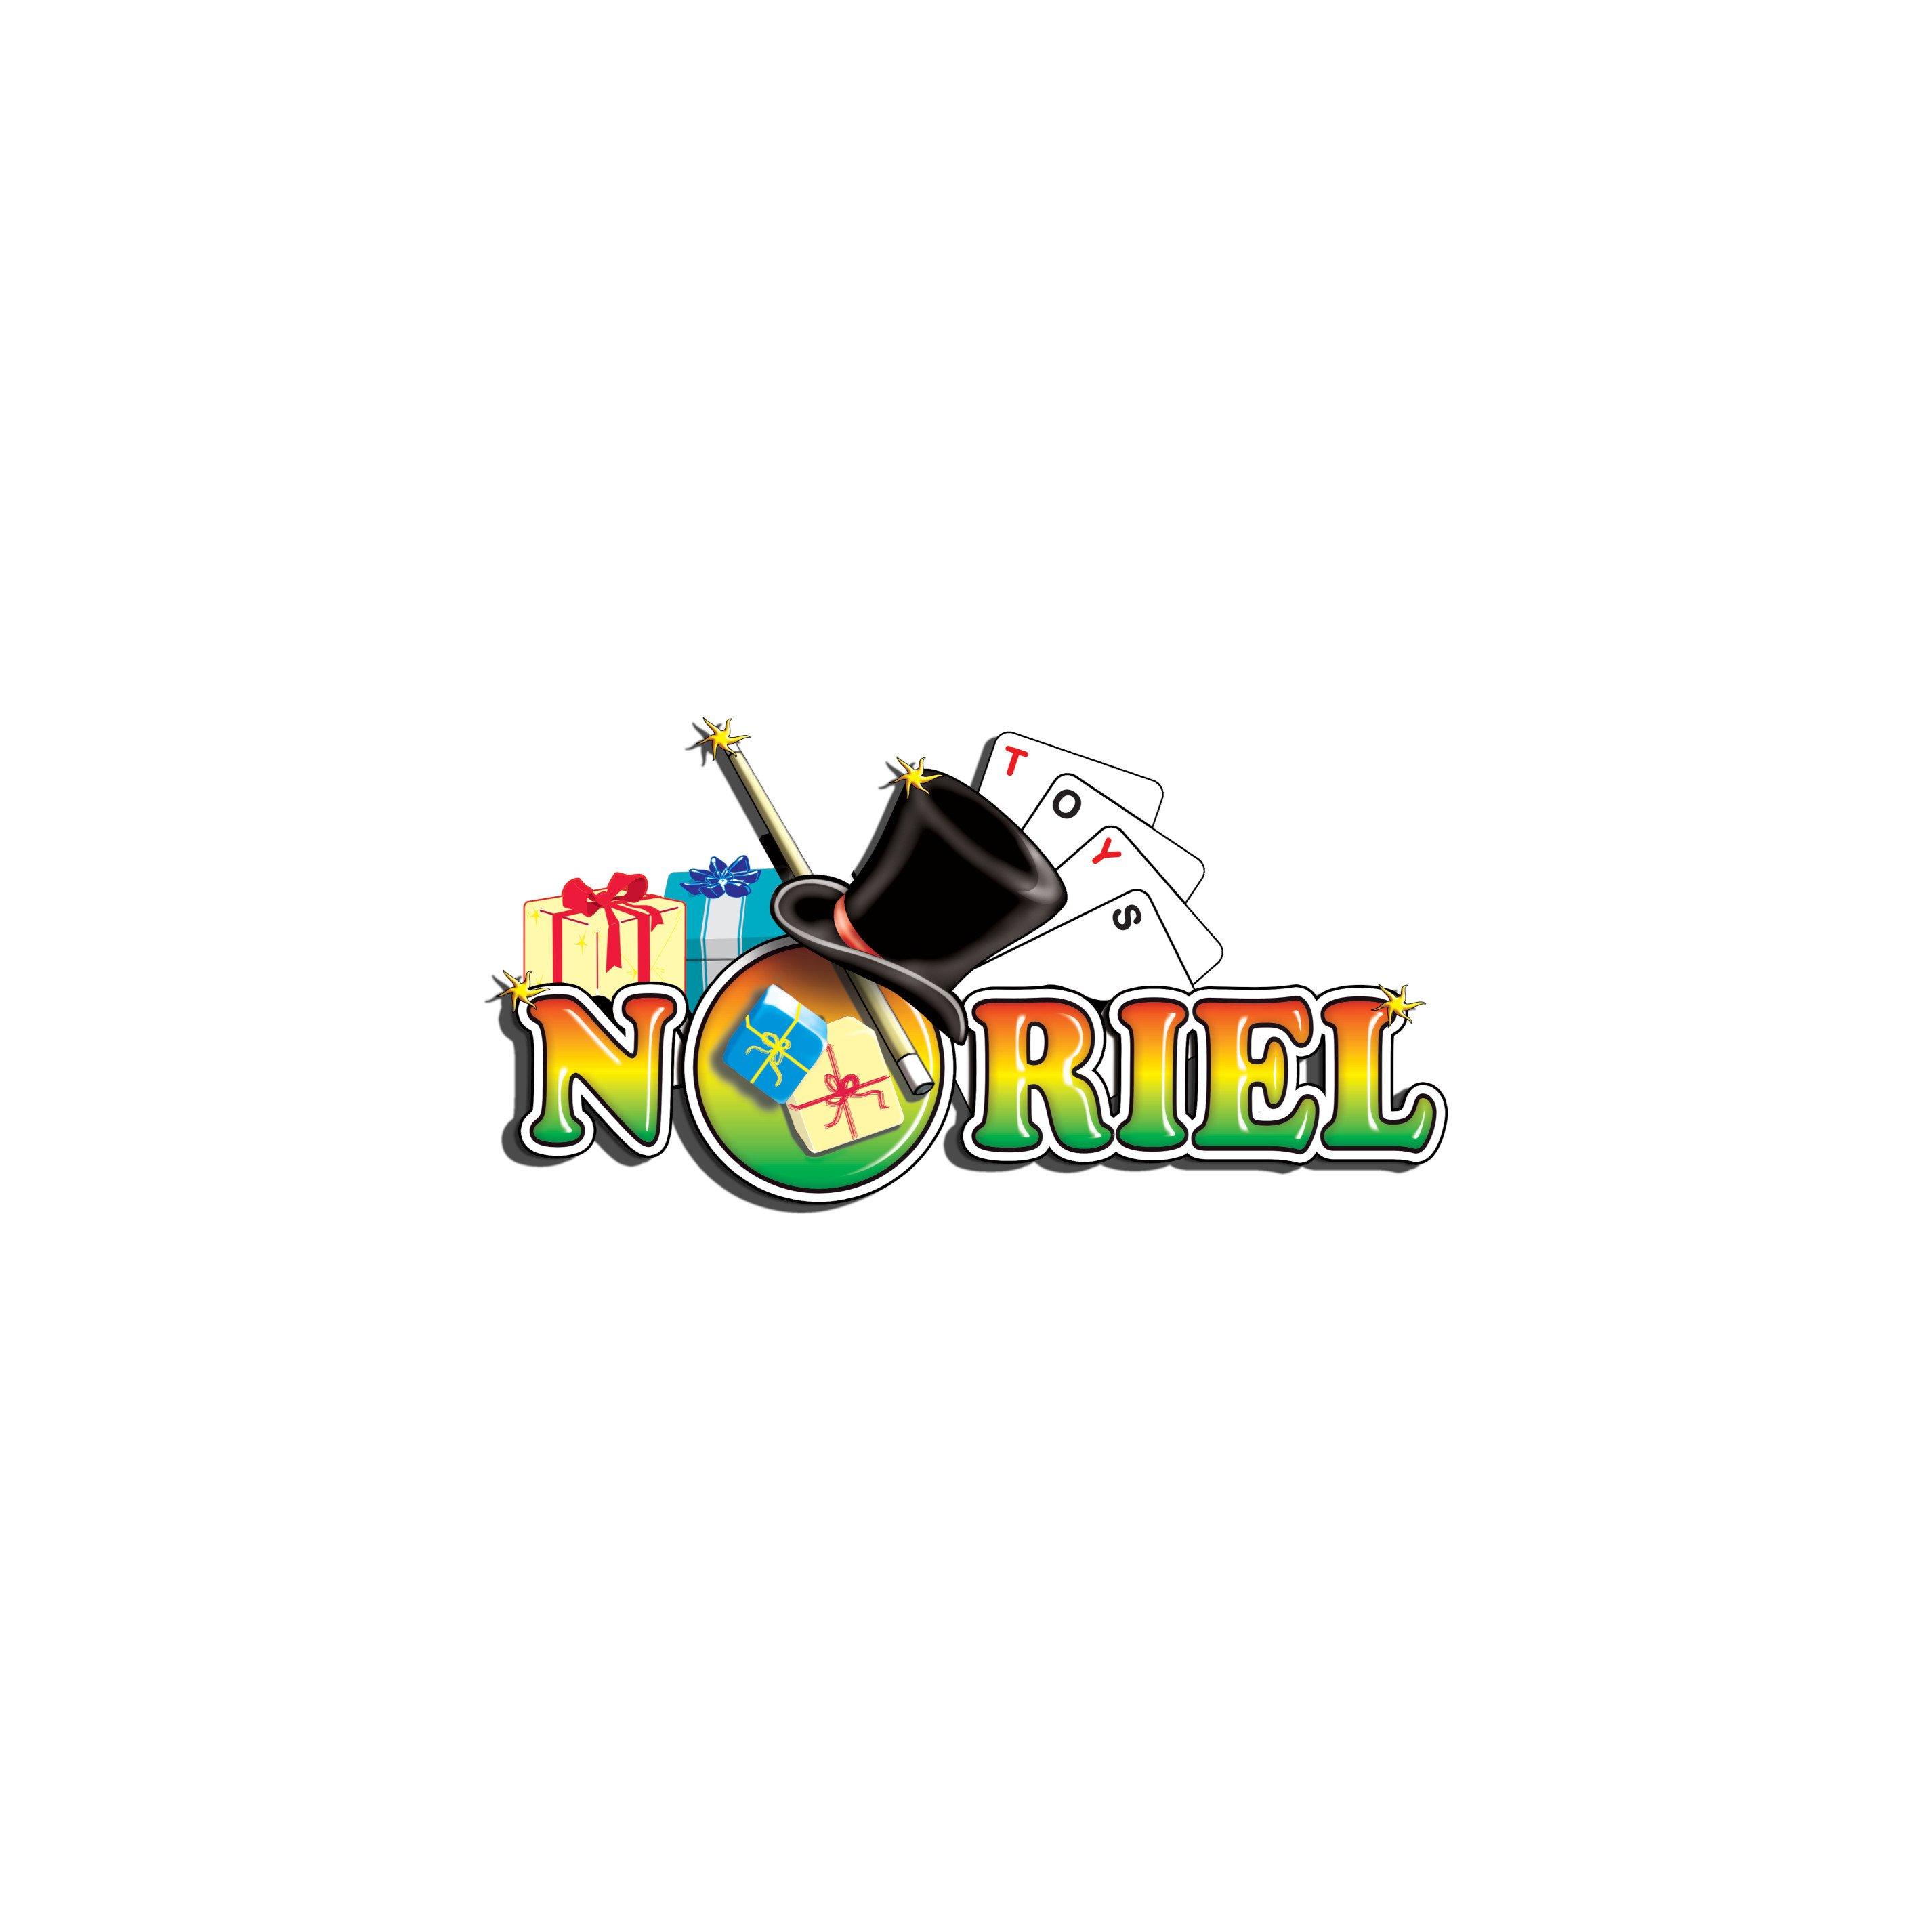 0312-GB01_001w Valiza pentru copii Ride-On Pedro Piratul Trunki, Negru, 46 cm